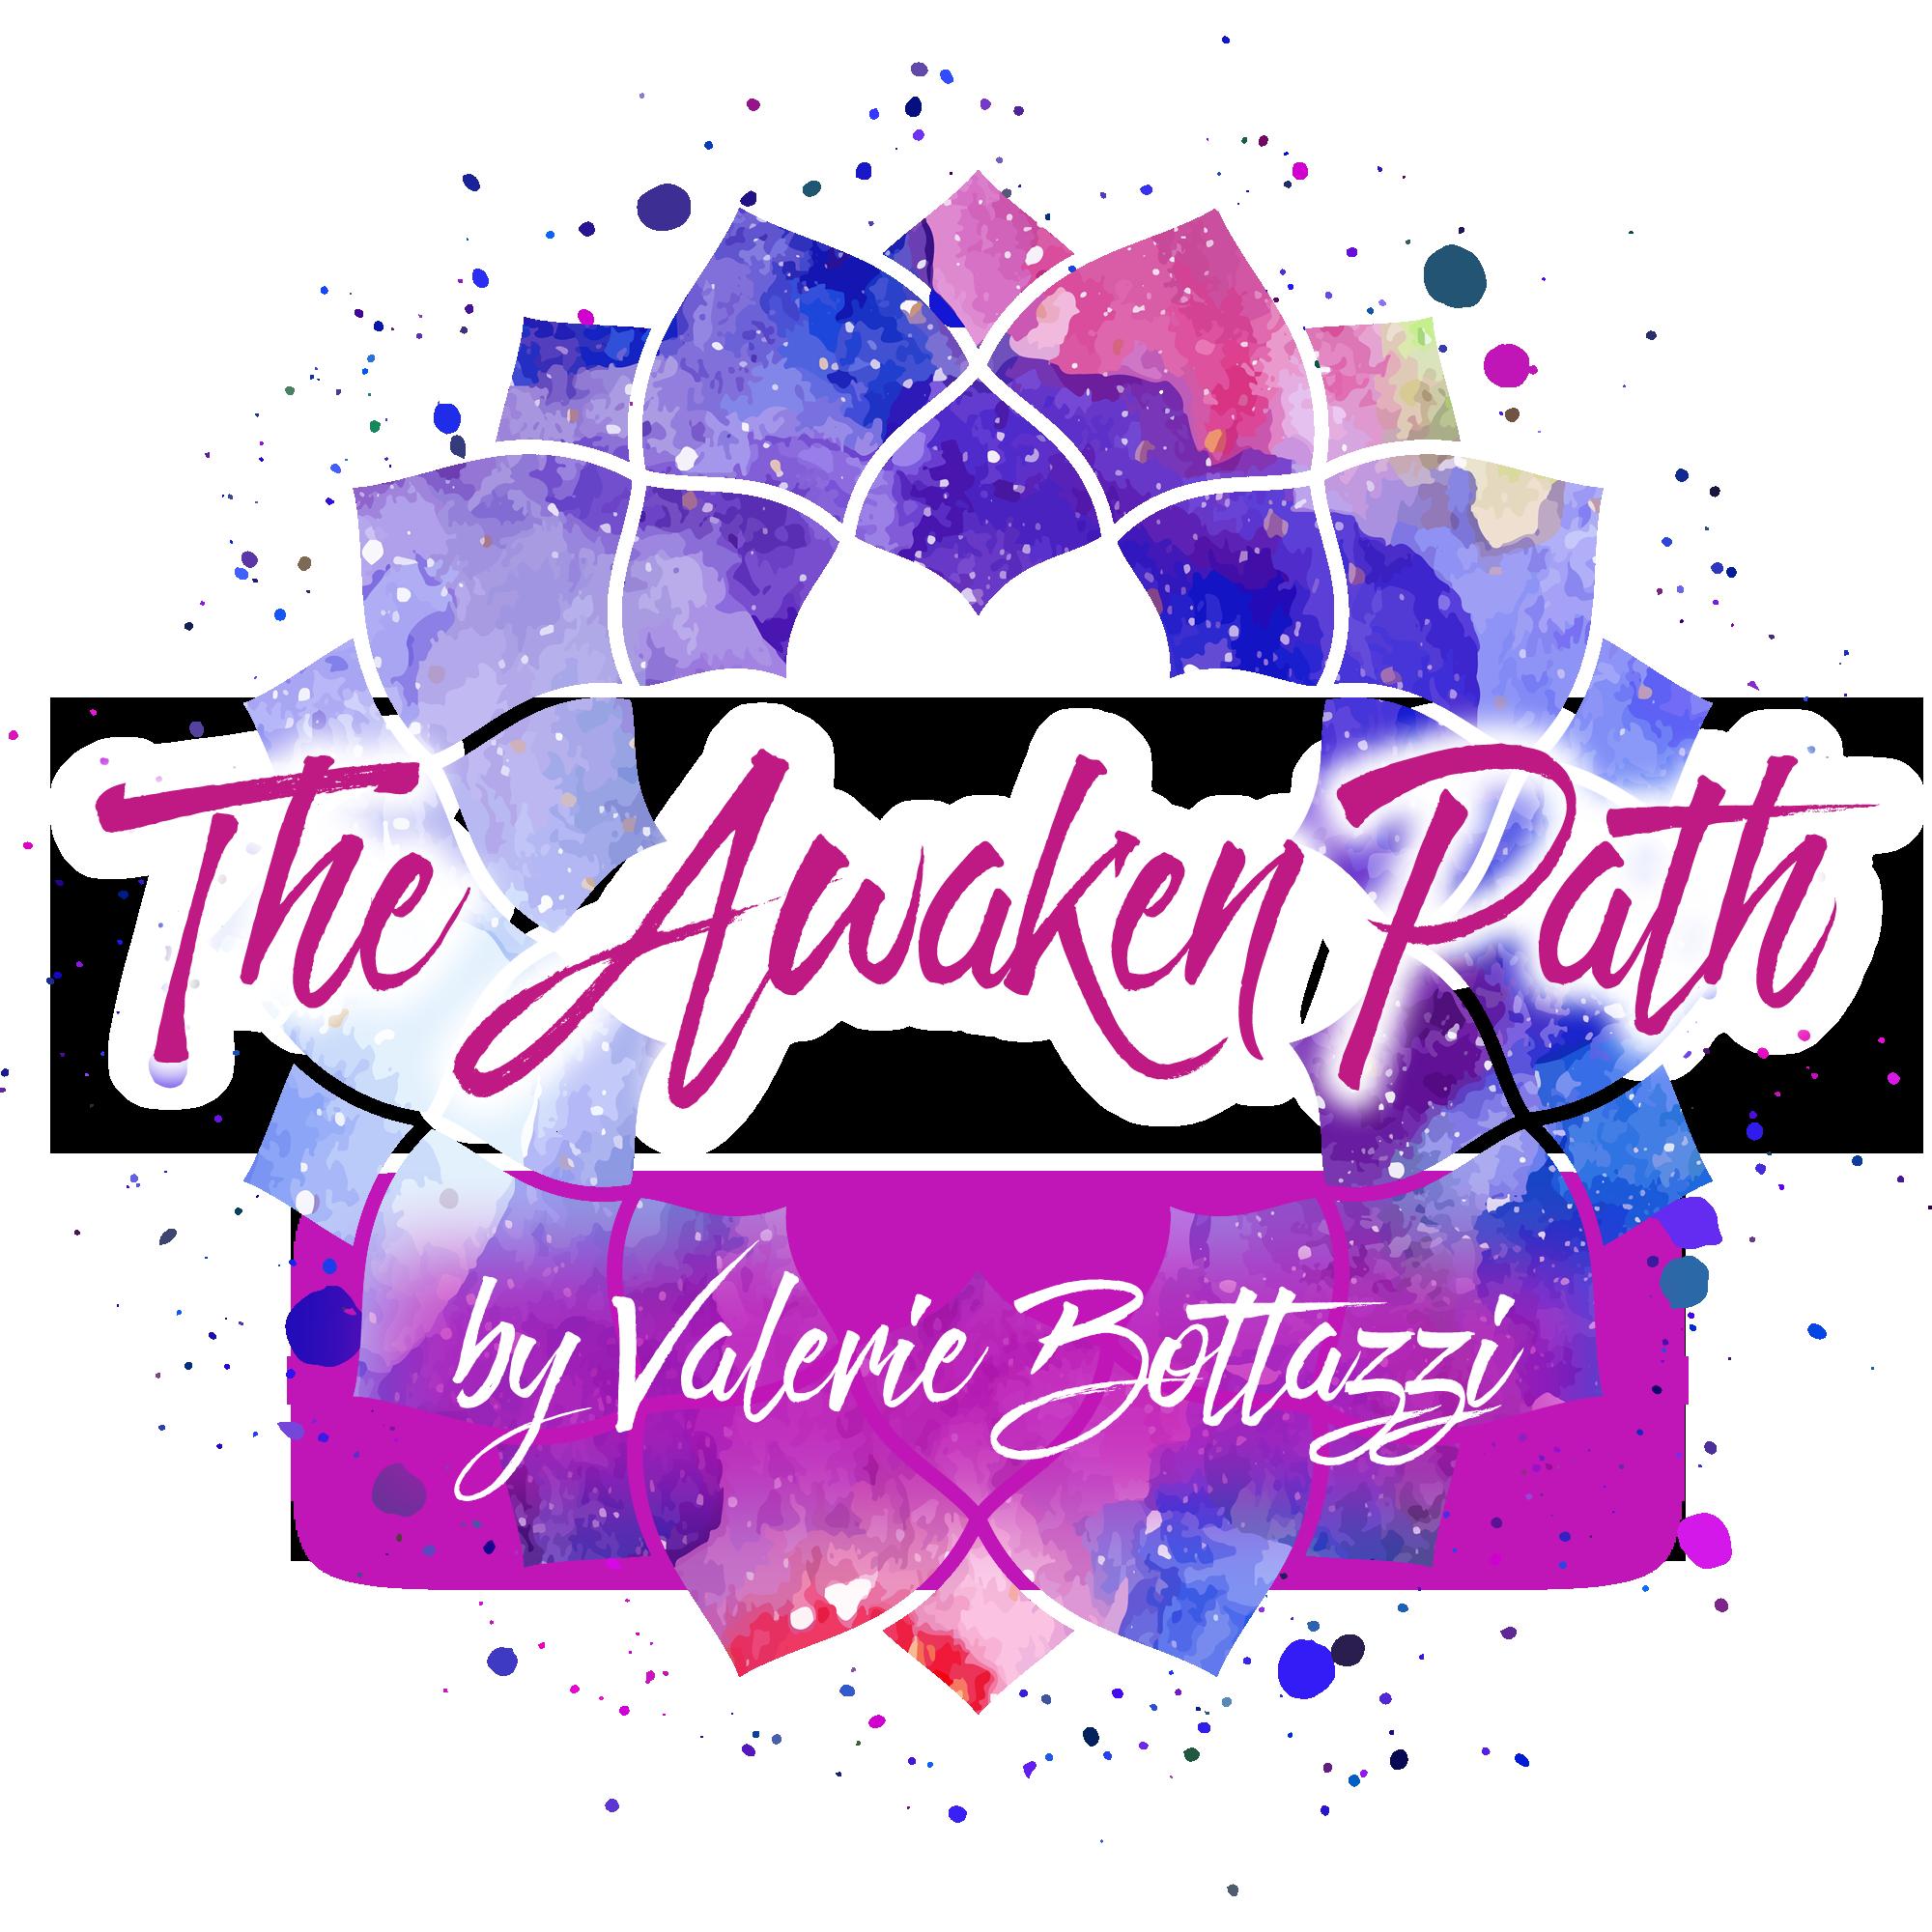 The Awaken Path School of Wisdom Icon Valerie Shakti Bottazzi